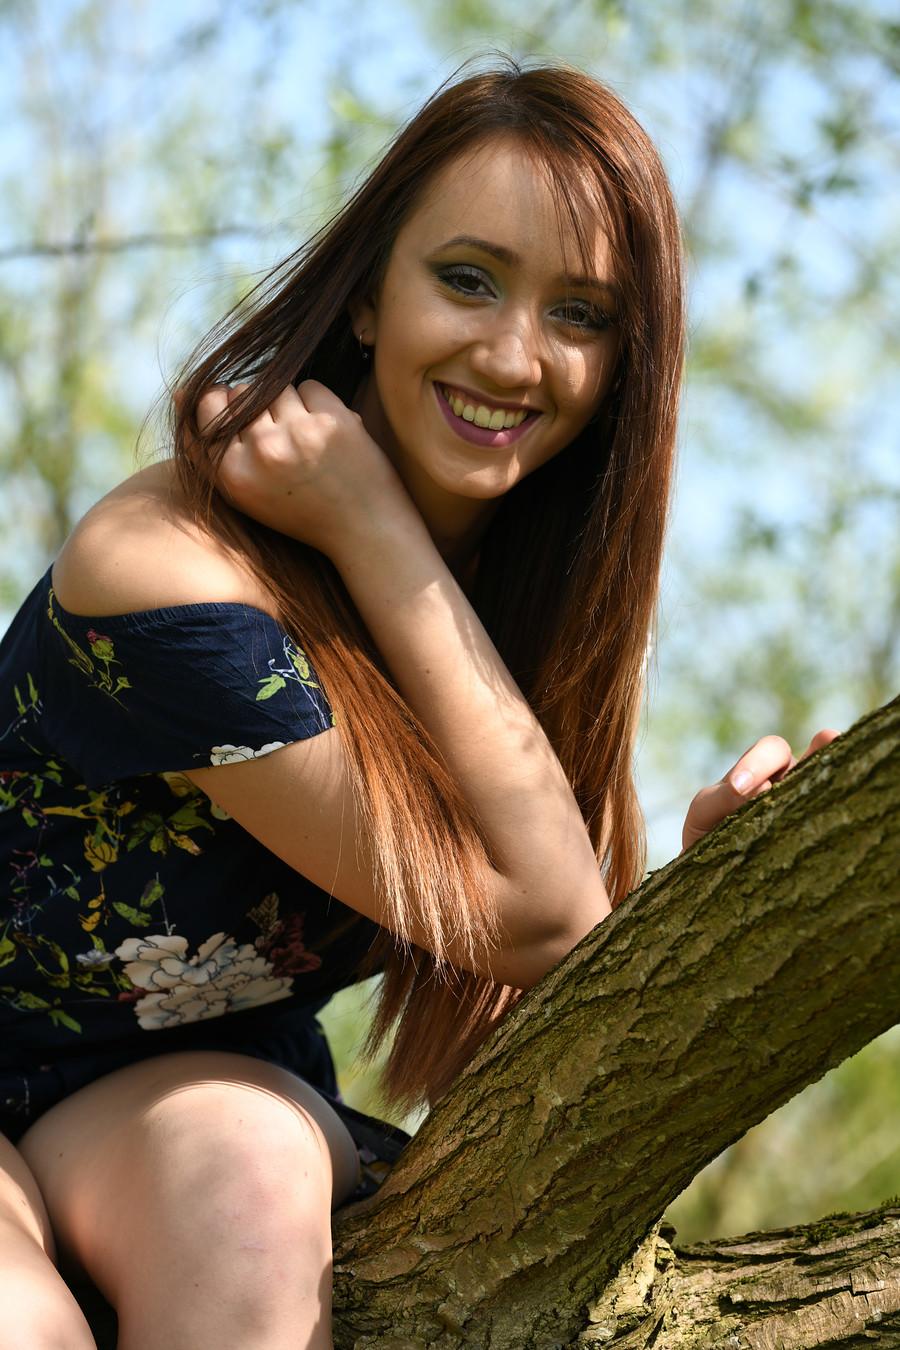 just smile! / Photography by Designer Photography, Model Sophie Alexandra / Uploaded 22nd April 2019 @ 10:16 PM